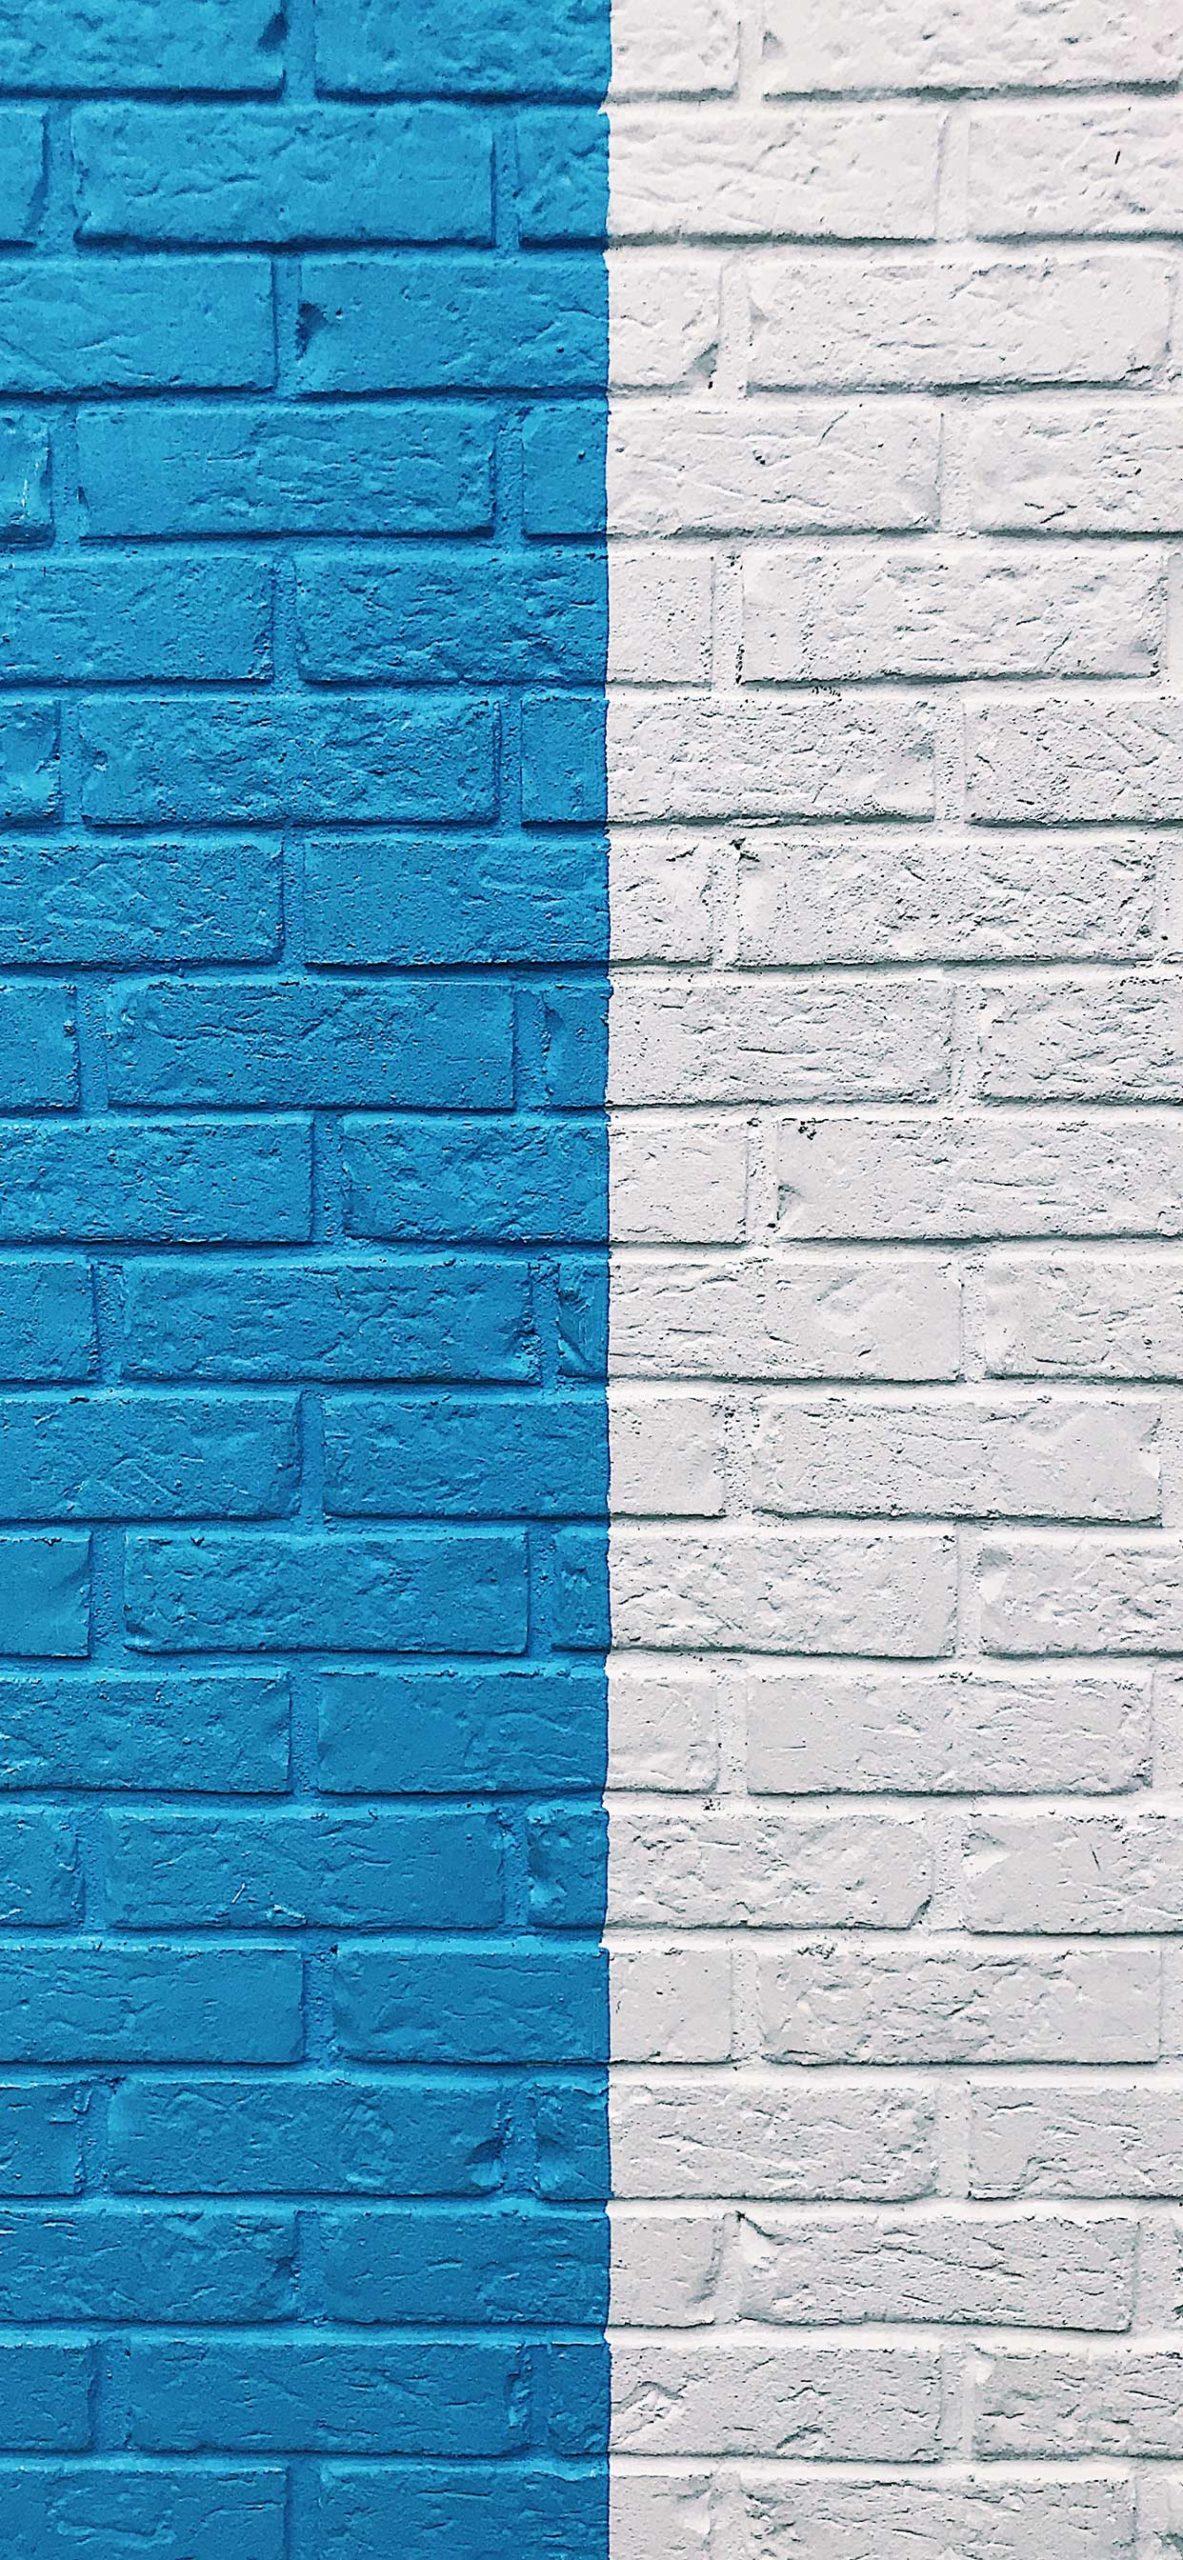 iphone wallpapers bricks2 scaled Bricks